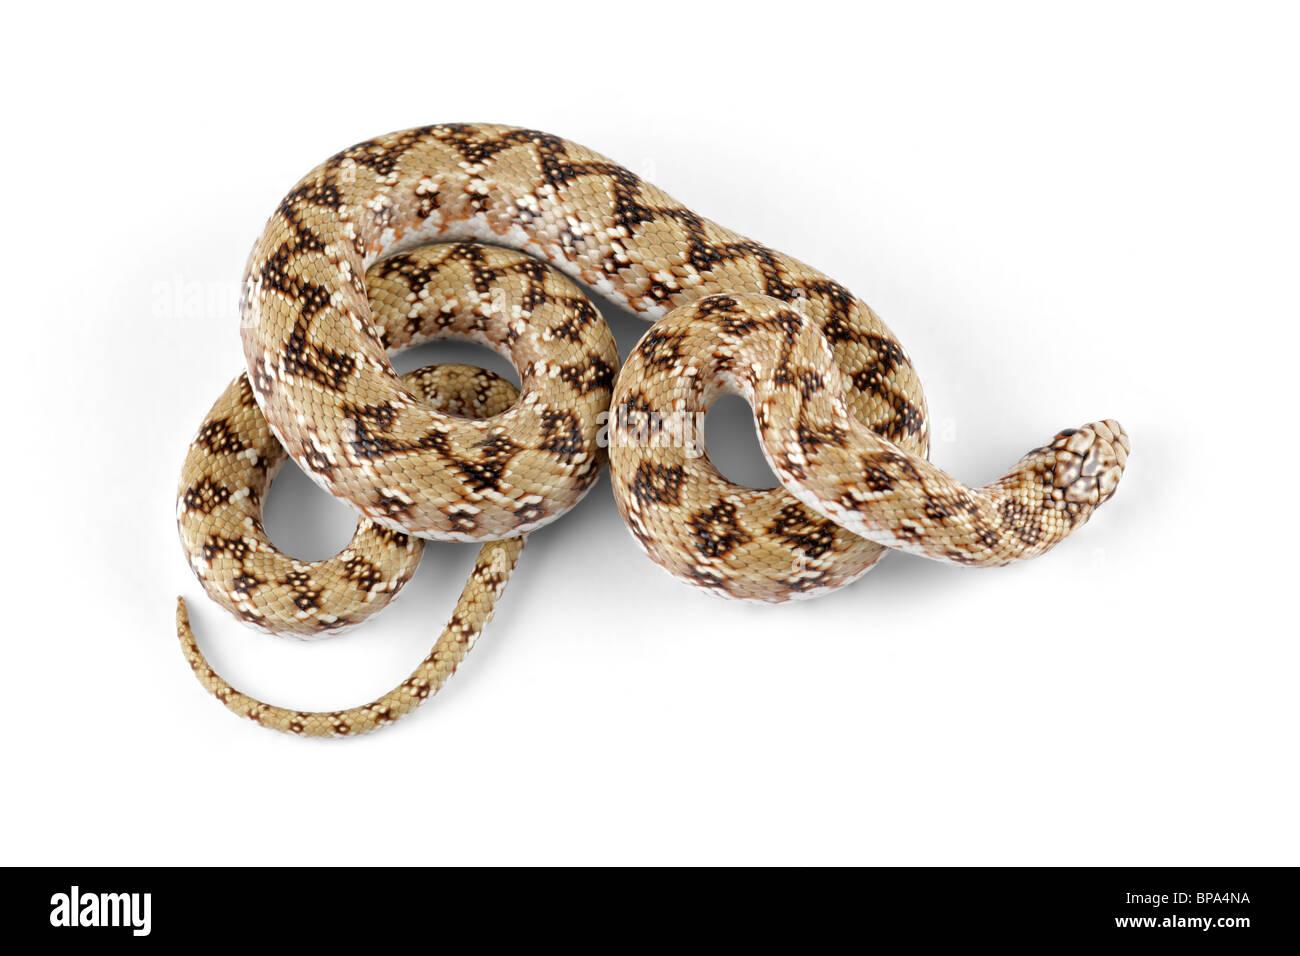 Dwarf beaked snake (Dipsina multimaculata) on white - Stock Image